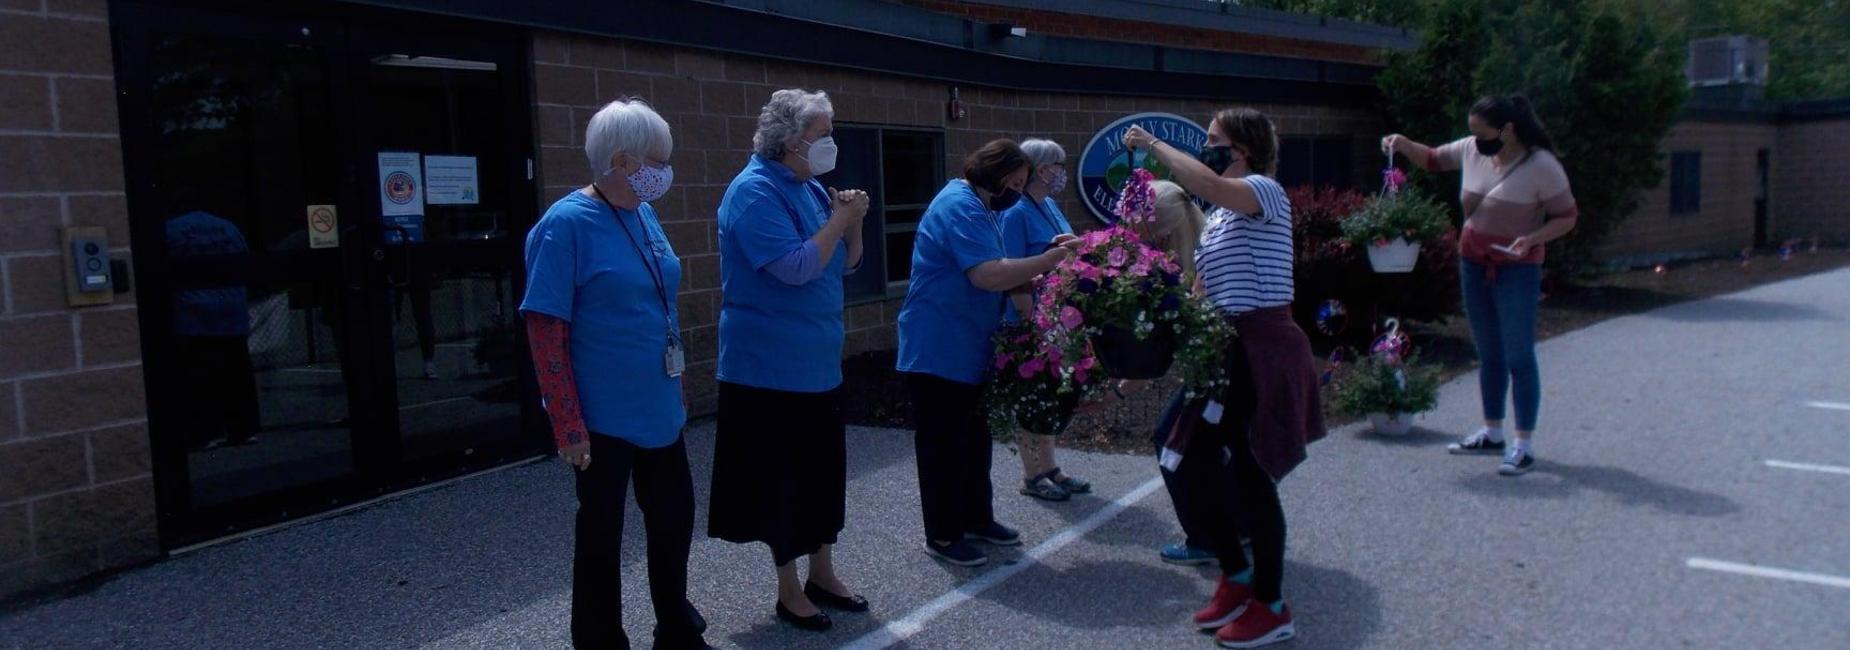 retirees receive flowers